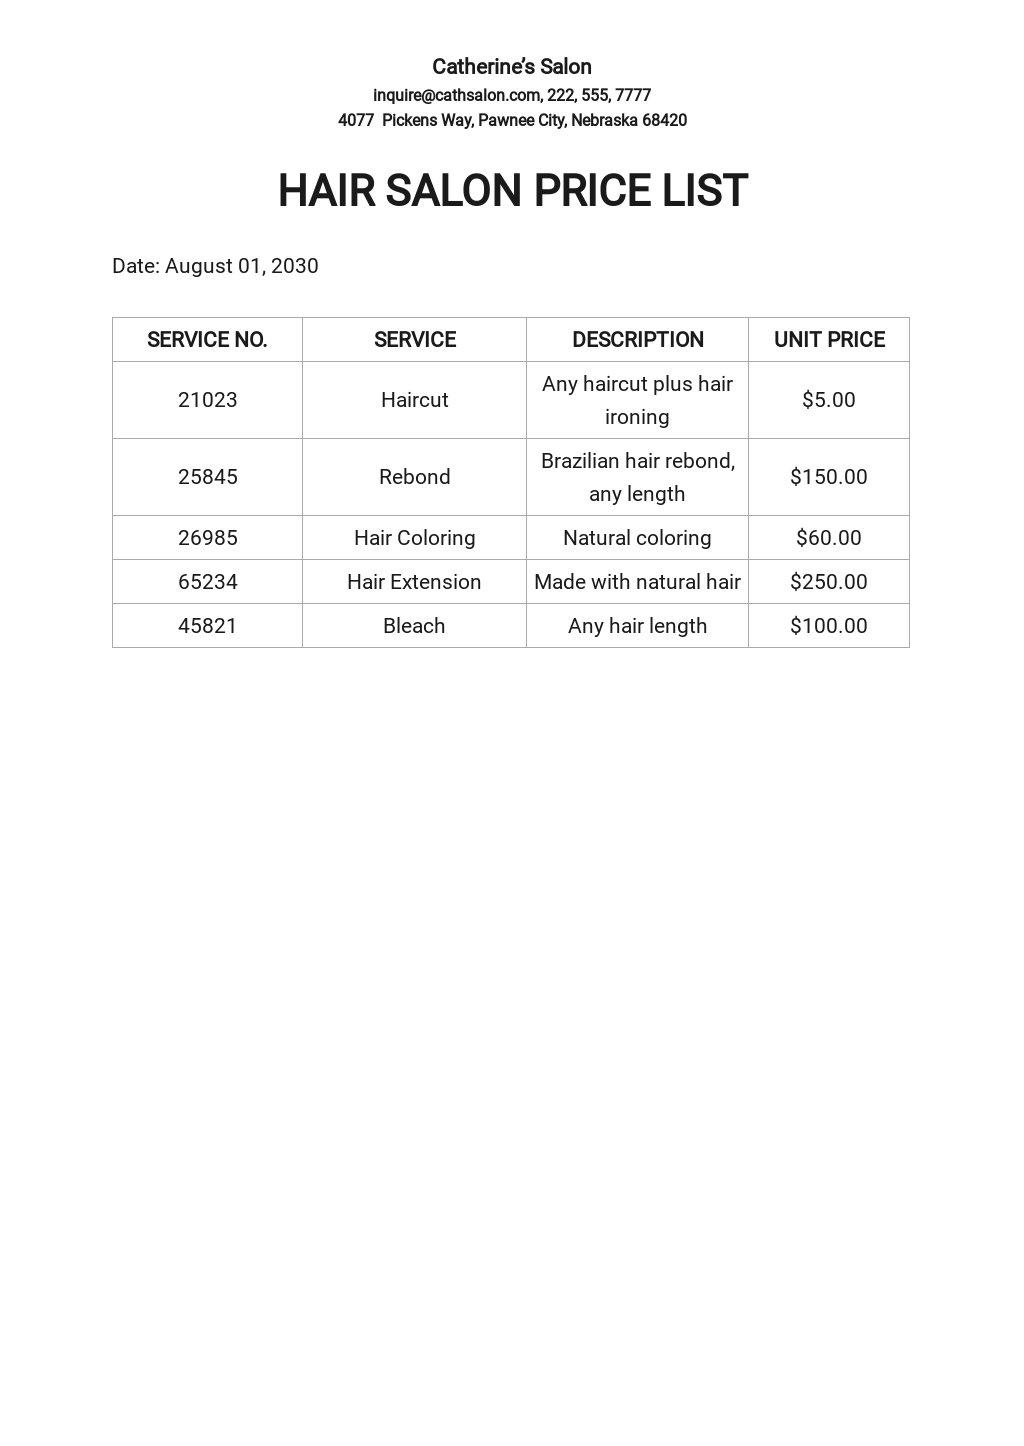 Hair Salon Price List Template.jpe